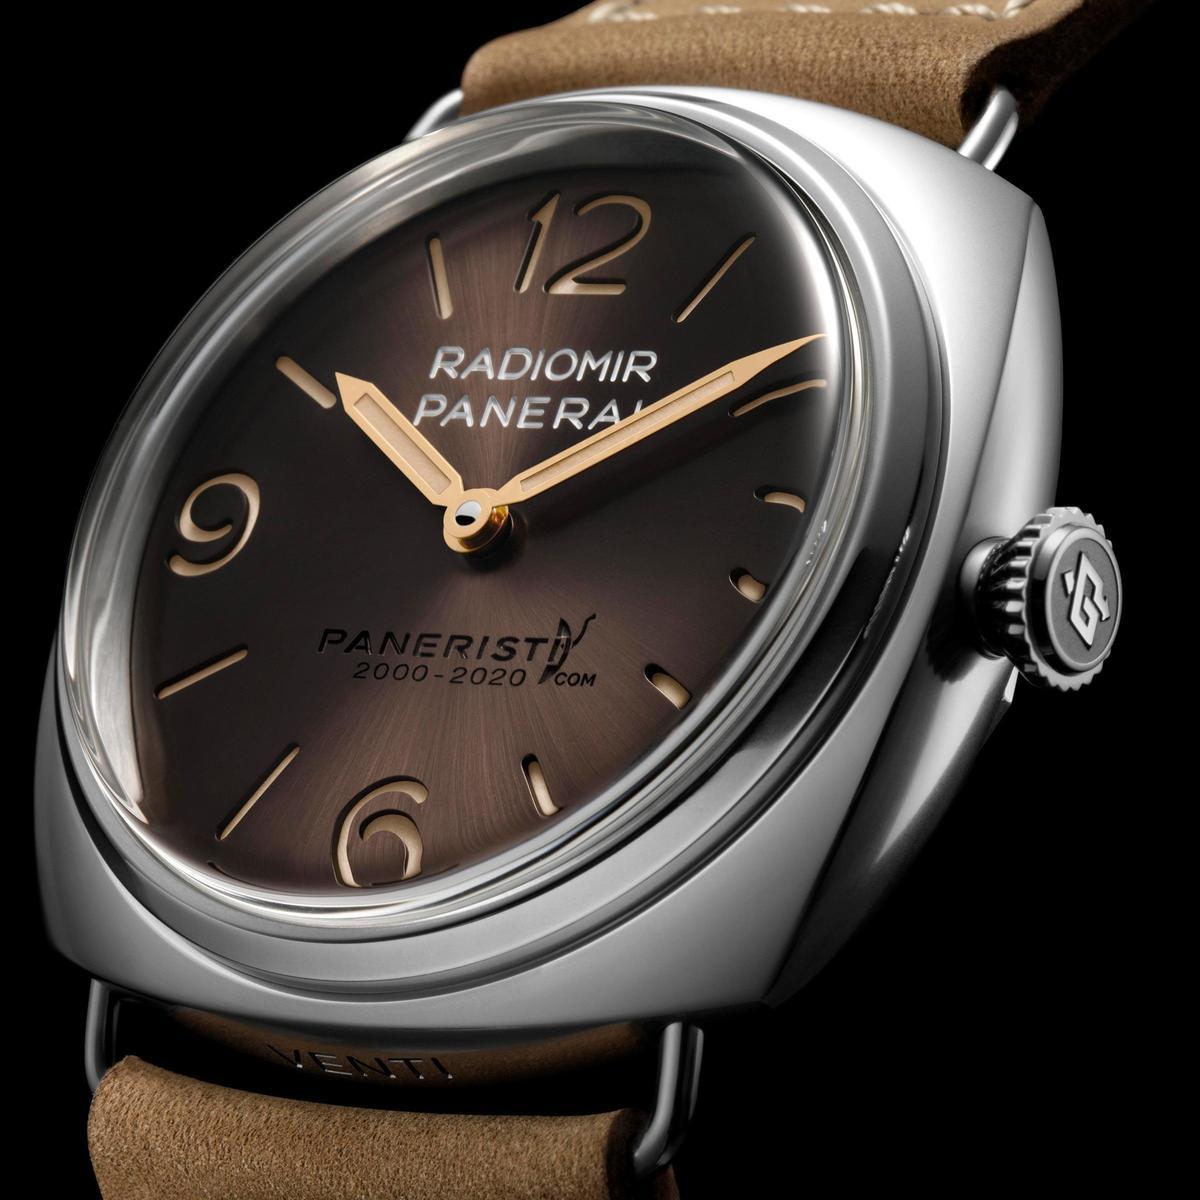 Radiomir Venti腕錶的棕色面盤與金色指針帶著濃濃的復古感。面盤上方刻有「PANERISTI.COM 2000-2020」字樣。